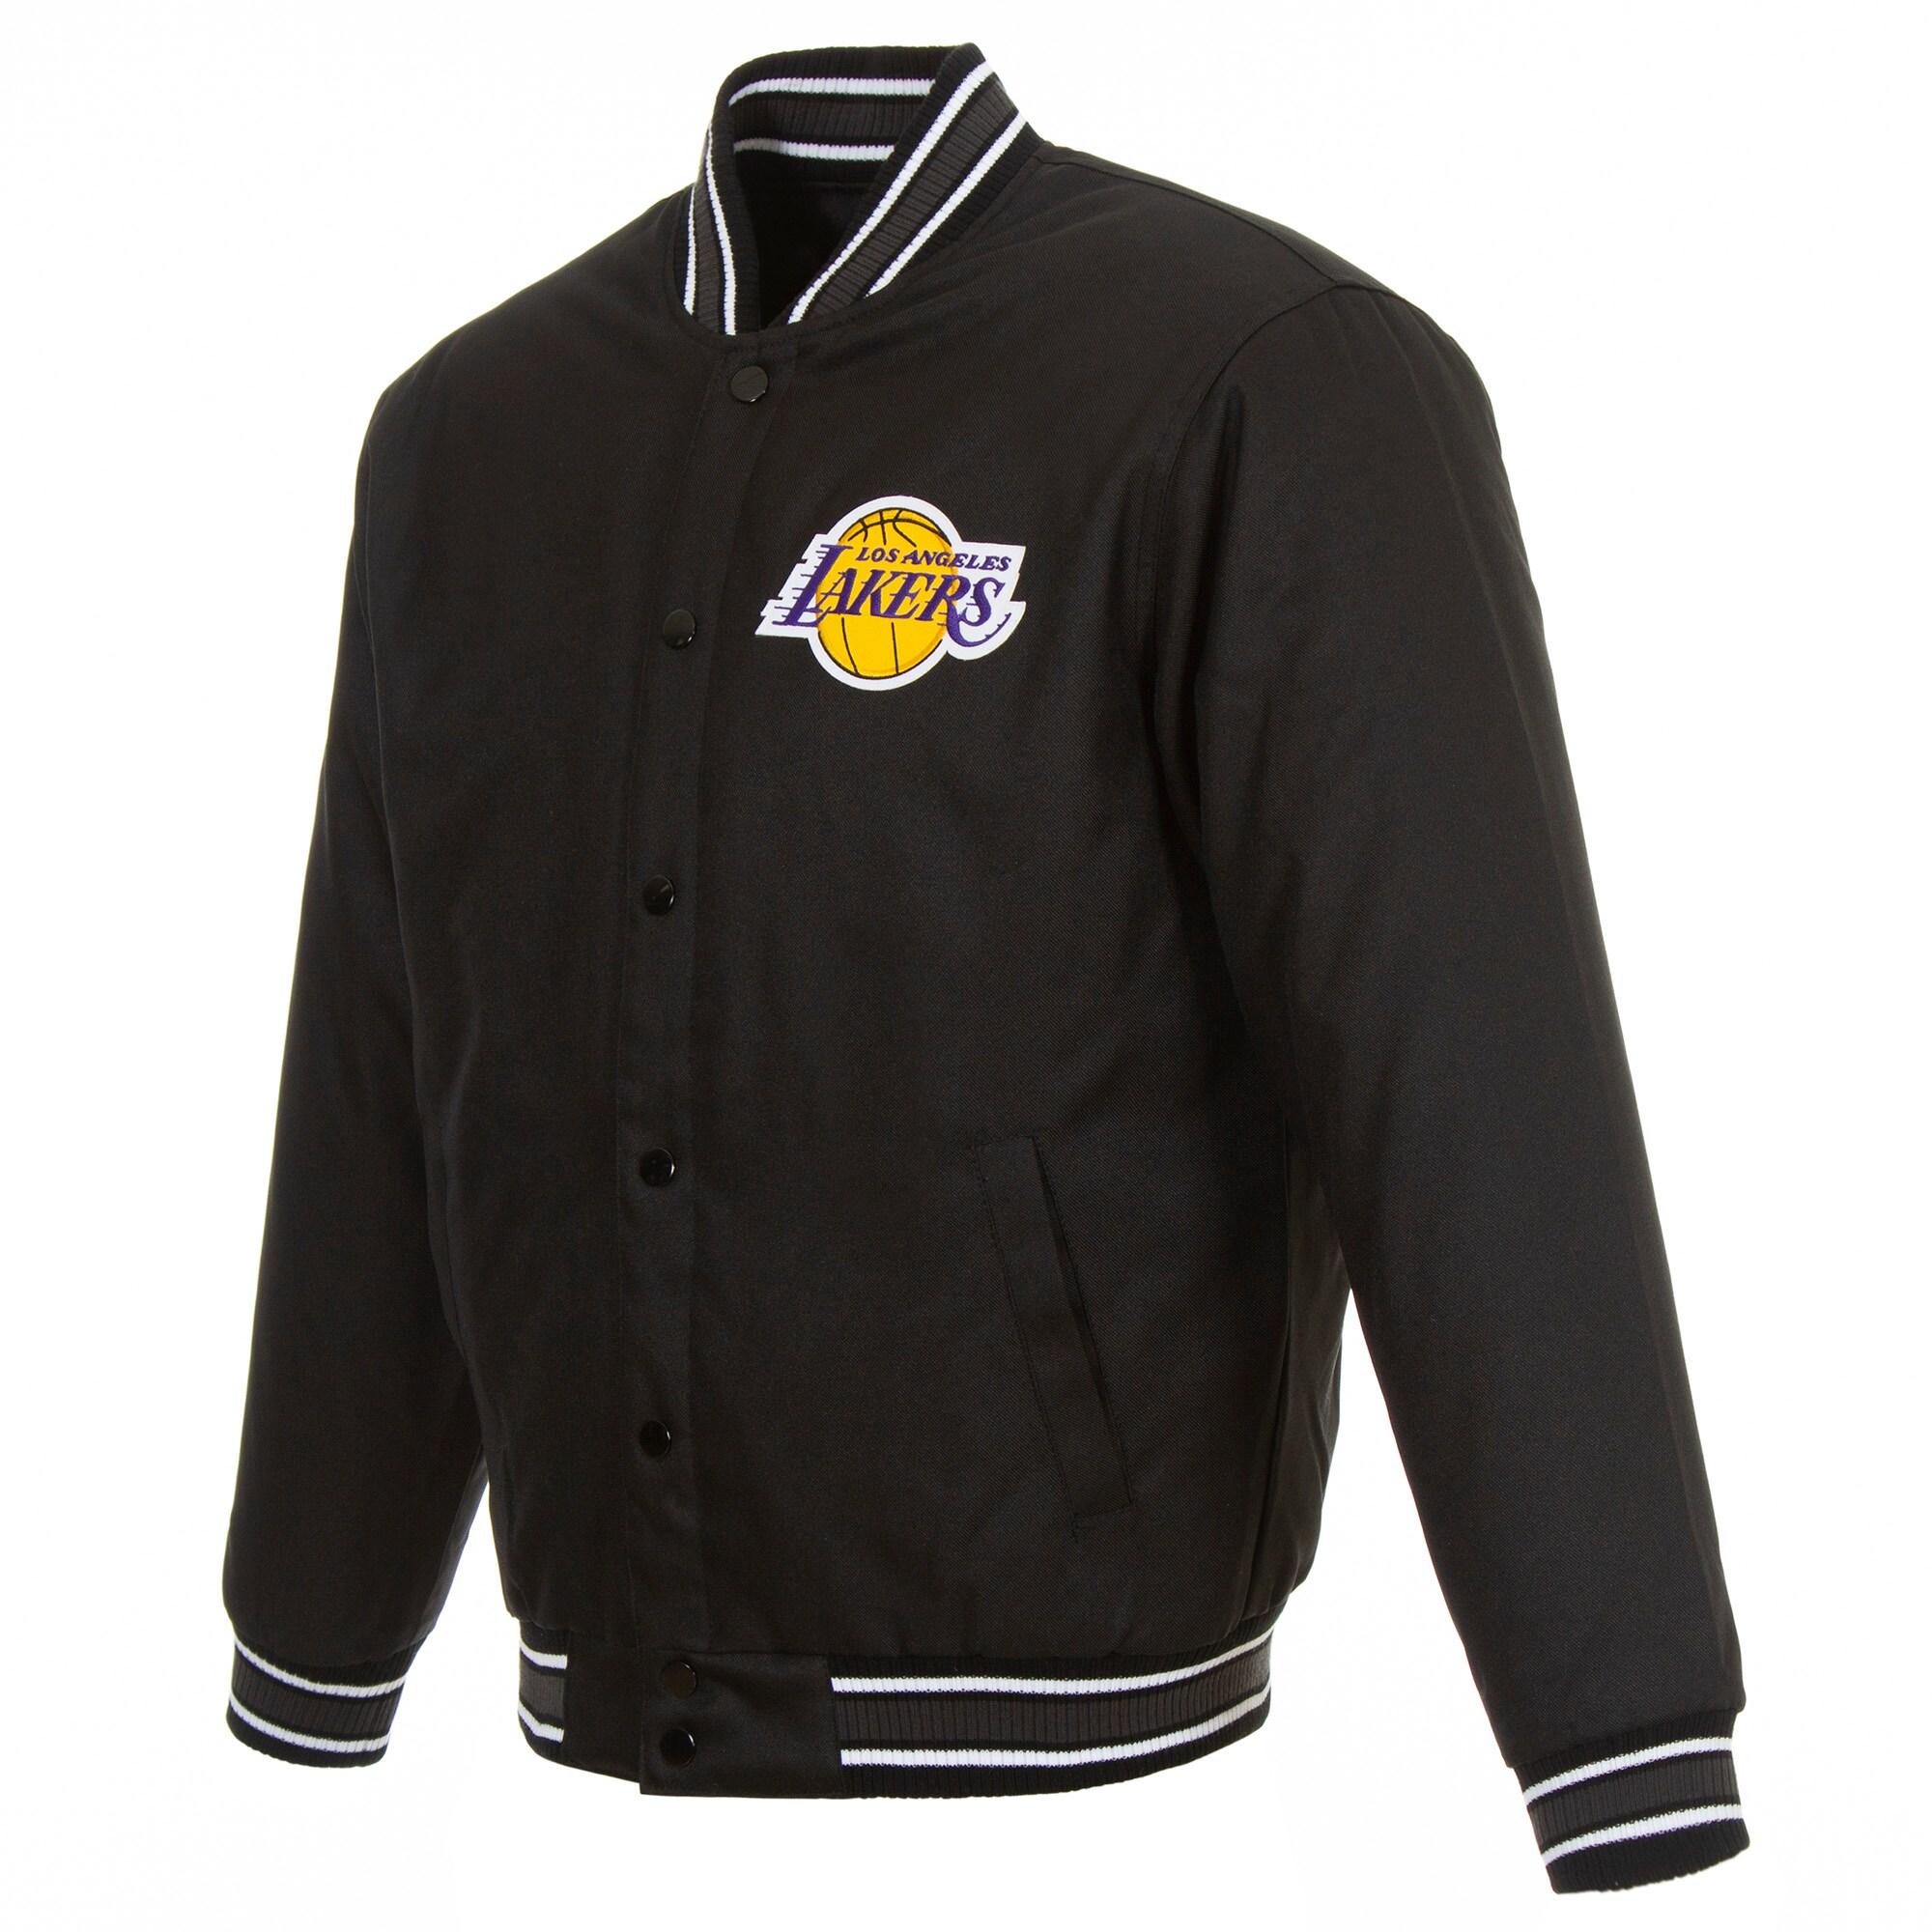 LeBron James Los Angeles Lakers Fanatics Branded Poly-Twill Jacket - Black